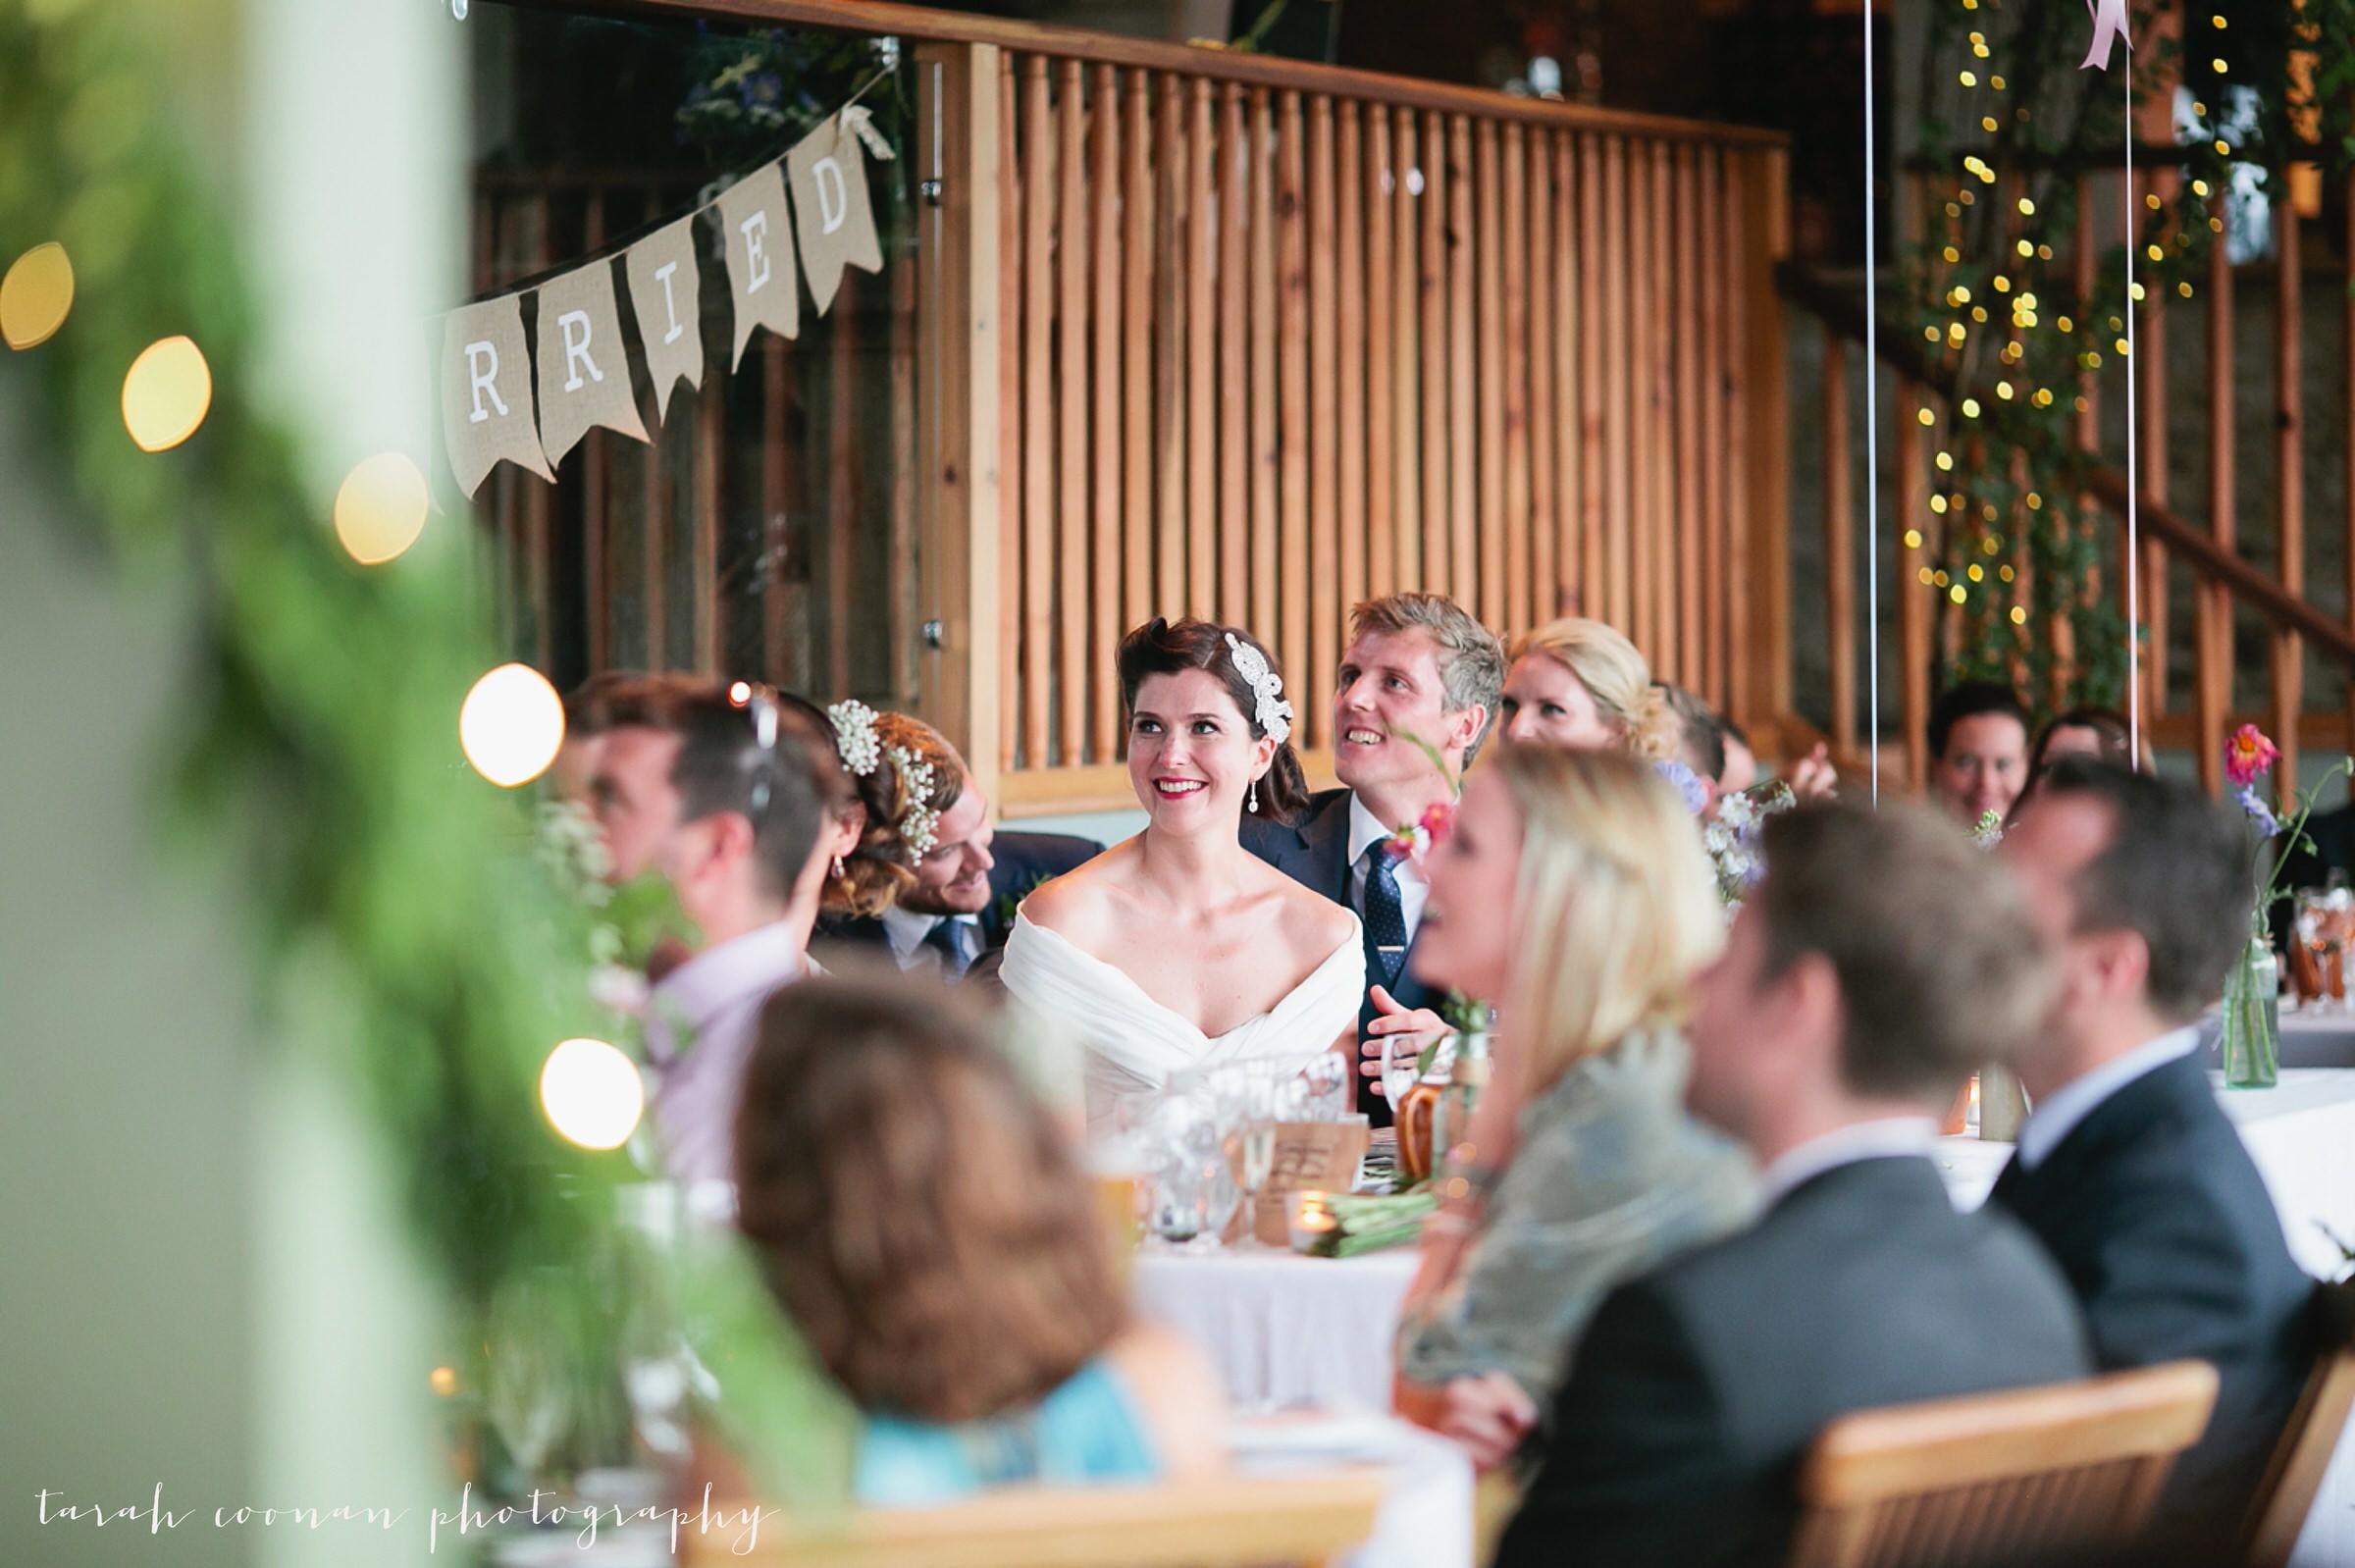 brighton-wedding-photographer85